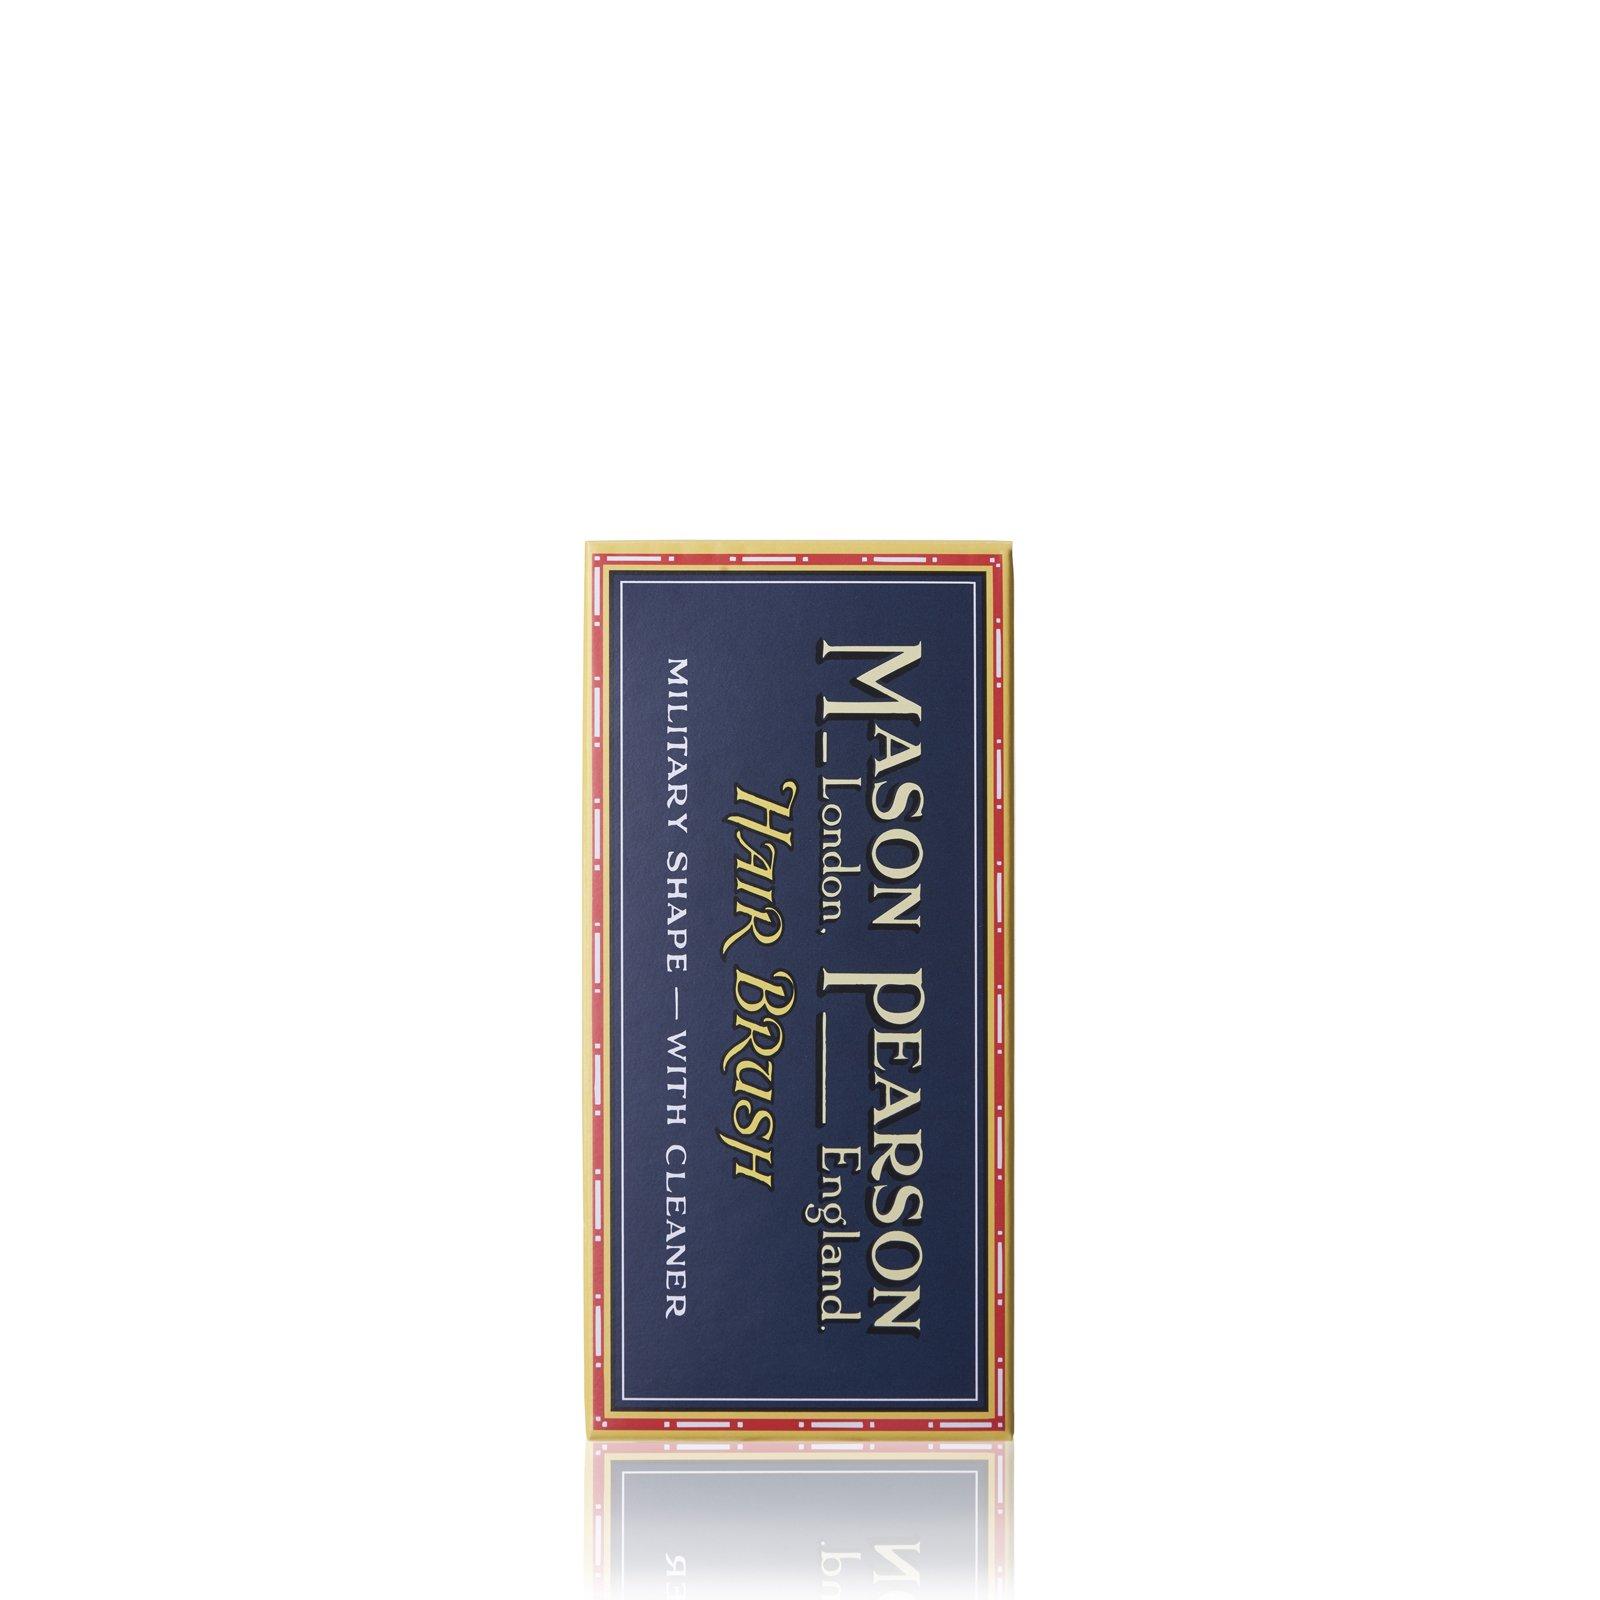 BN1M Popular Military Hairbrush from Mason Pearson (Dark ruby)